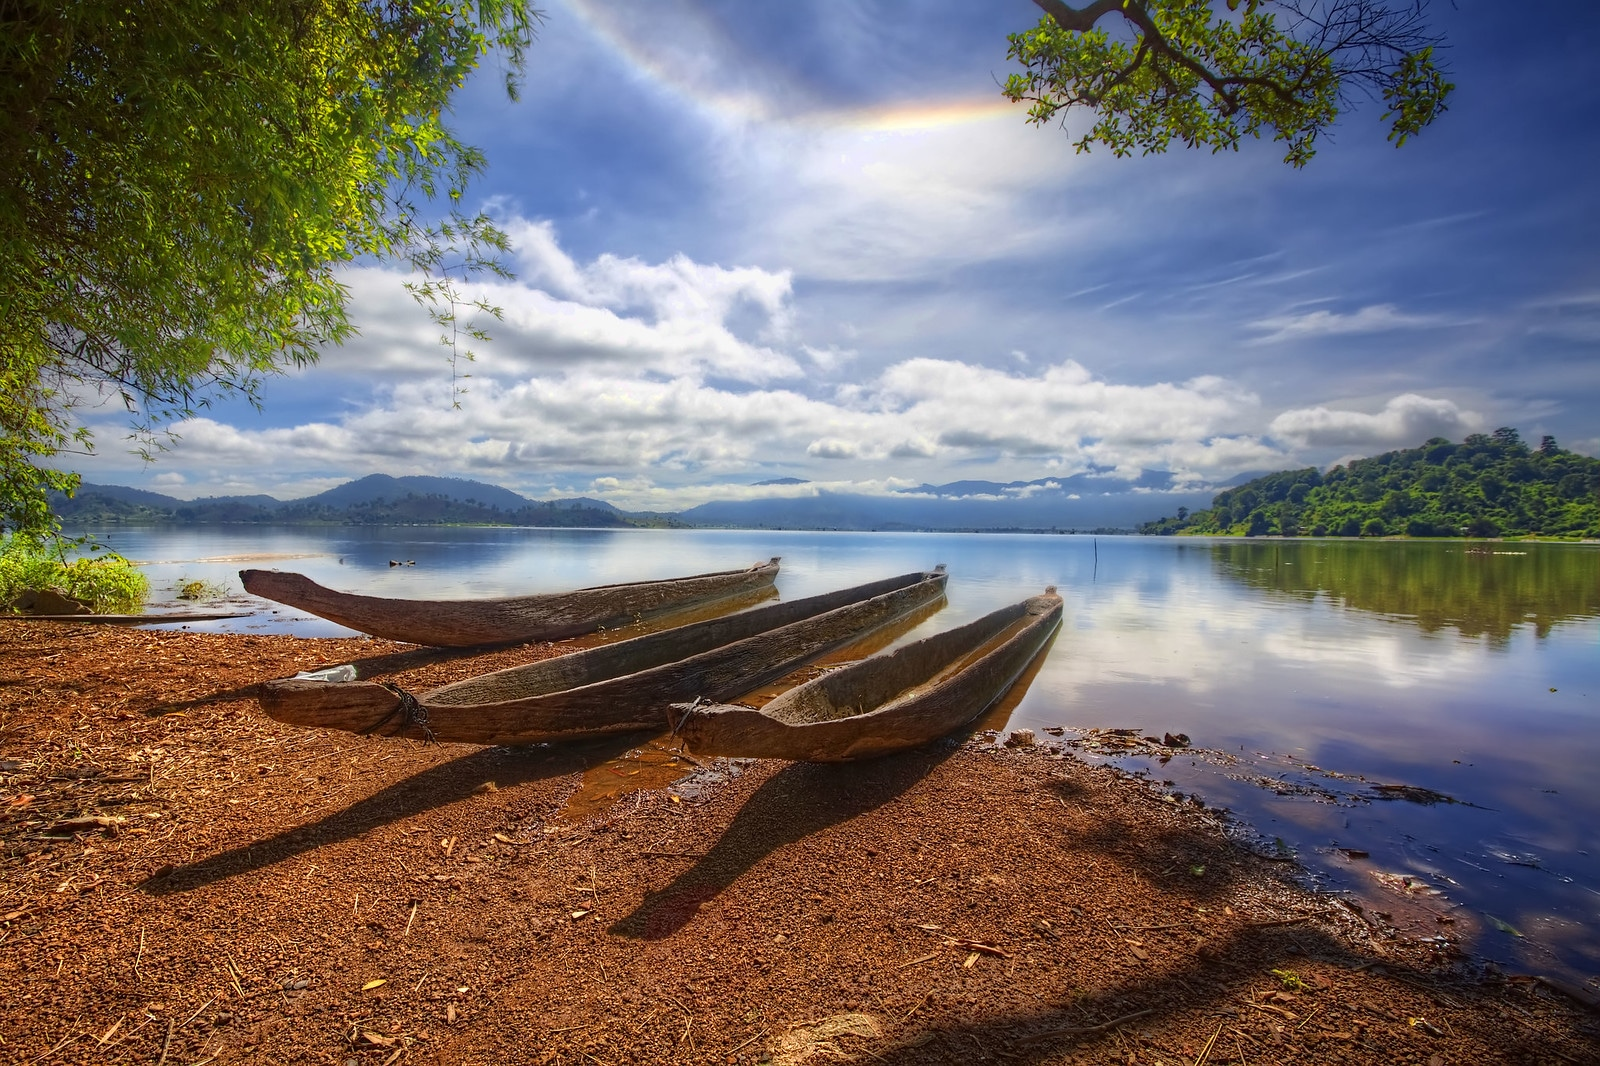 Lak Lake in Dak Lak Province Vietnam